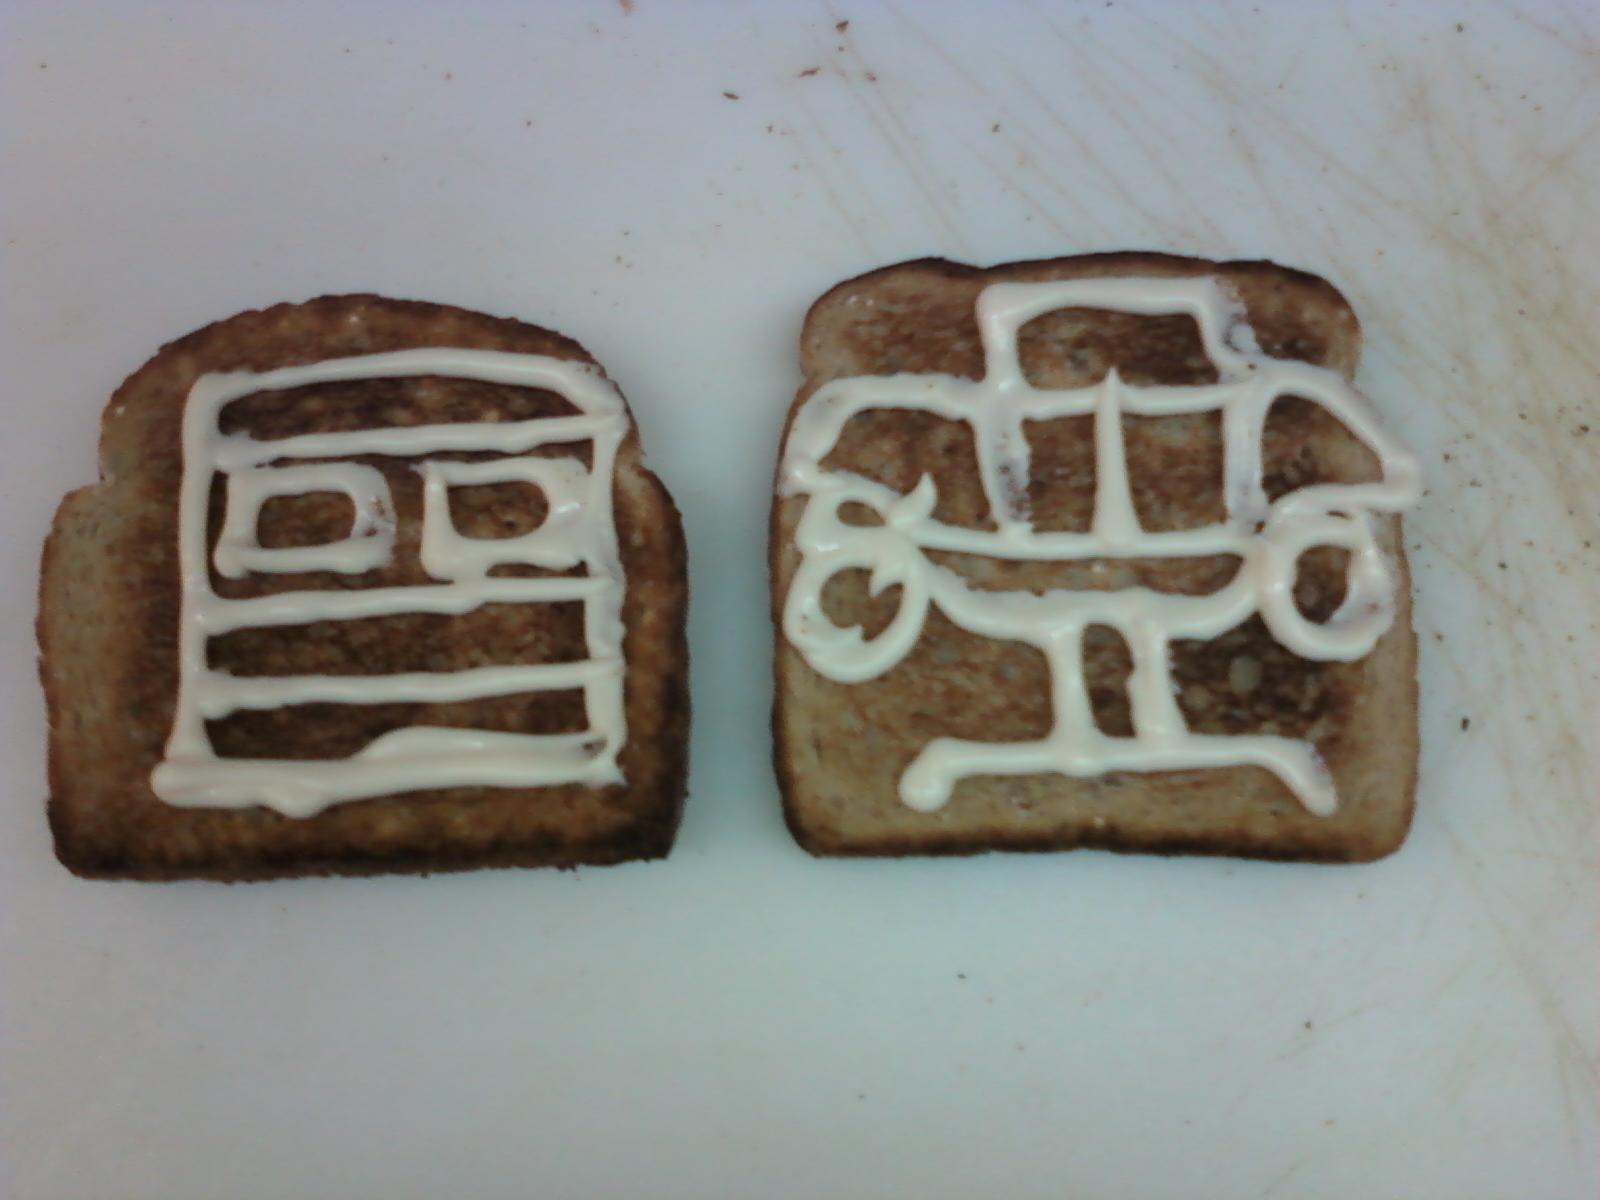 sandwich_art/0806110847.jpg